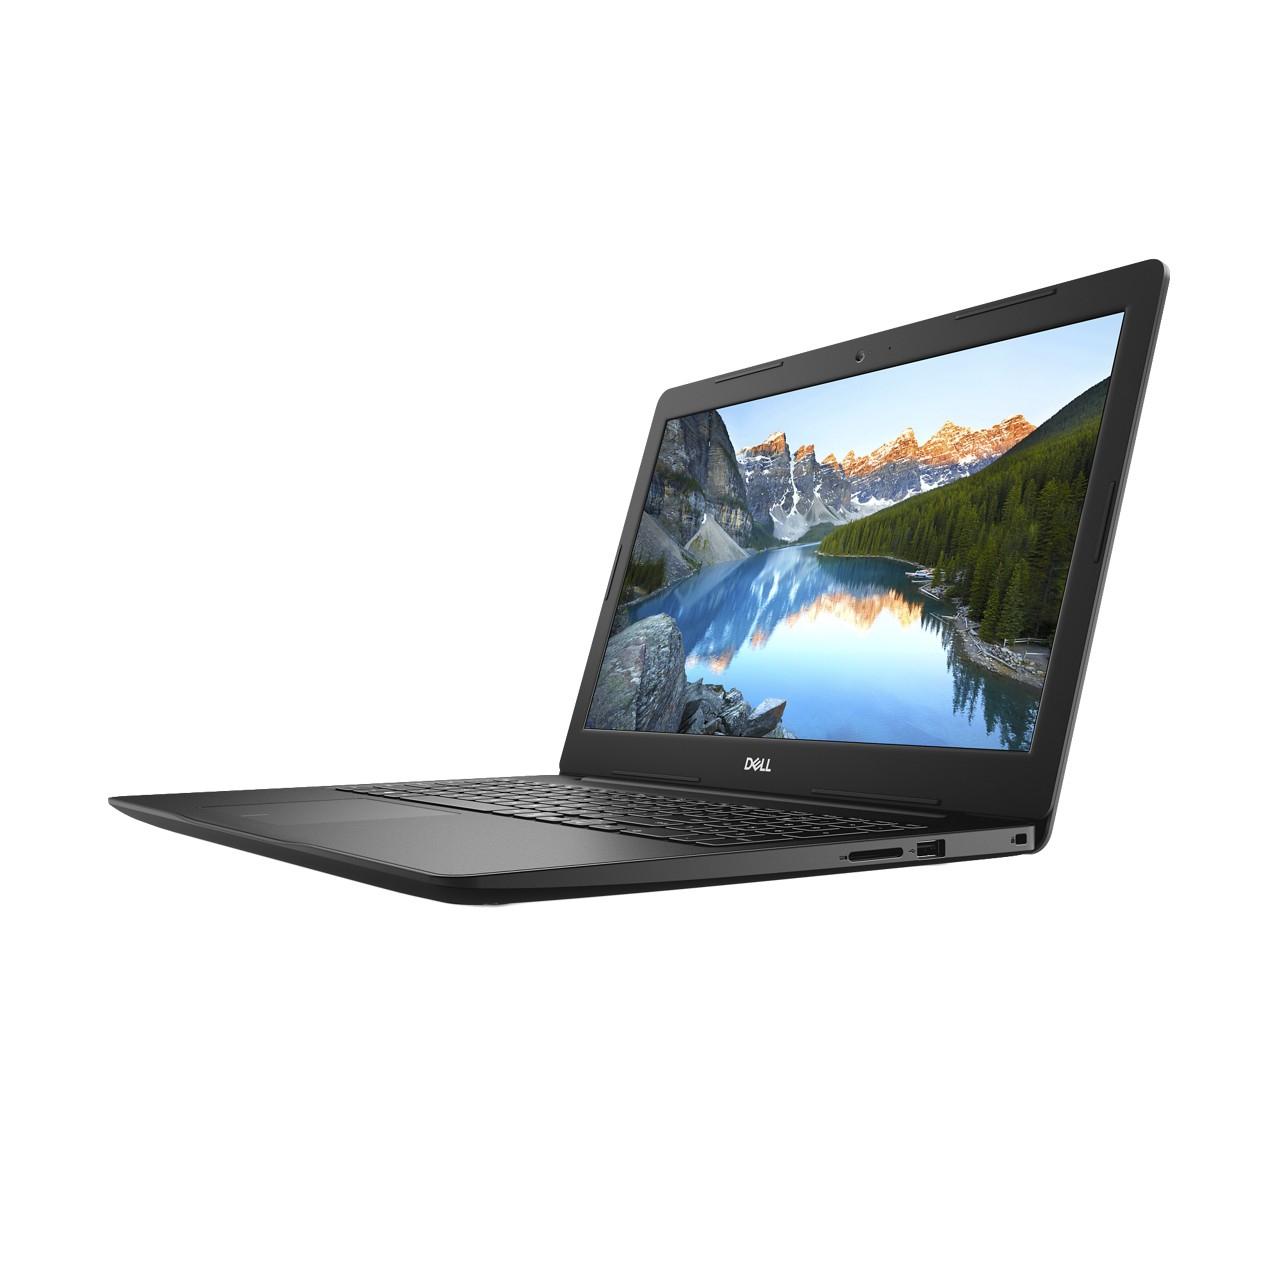 Notebook Dell Inspiron 3584 Core I3 8130u Memoria 4gb Ssd 128gb Tela Led 15.6' Hd Sistema Windows 10 Home